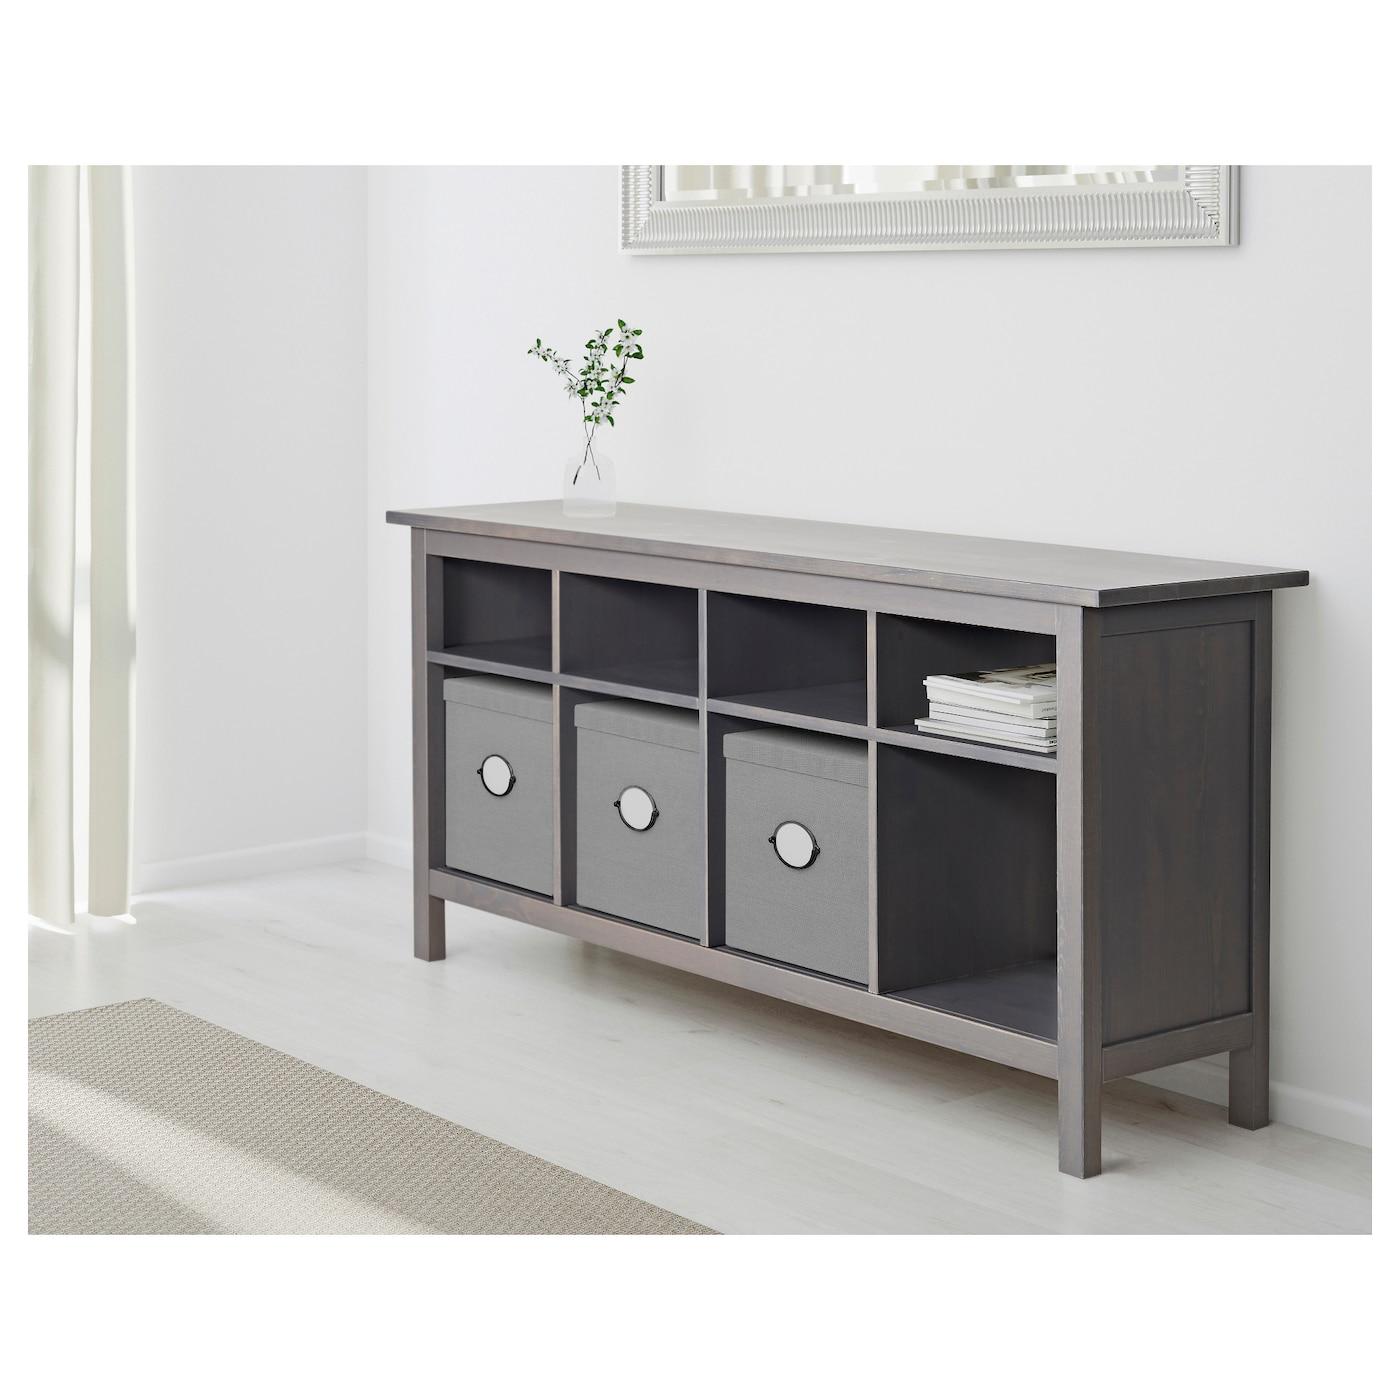 Wondrous Hemnes Console Table Black Brown Home Interior And Landscaping Spoatsignezvosmurscom